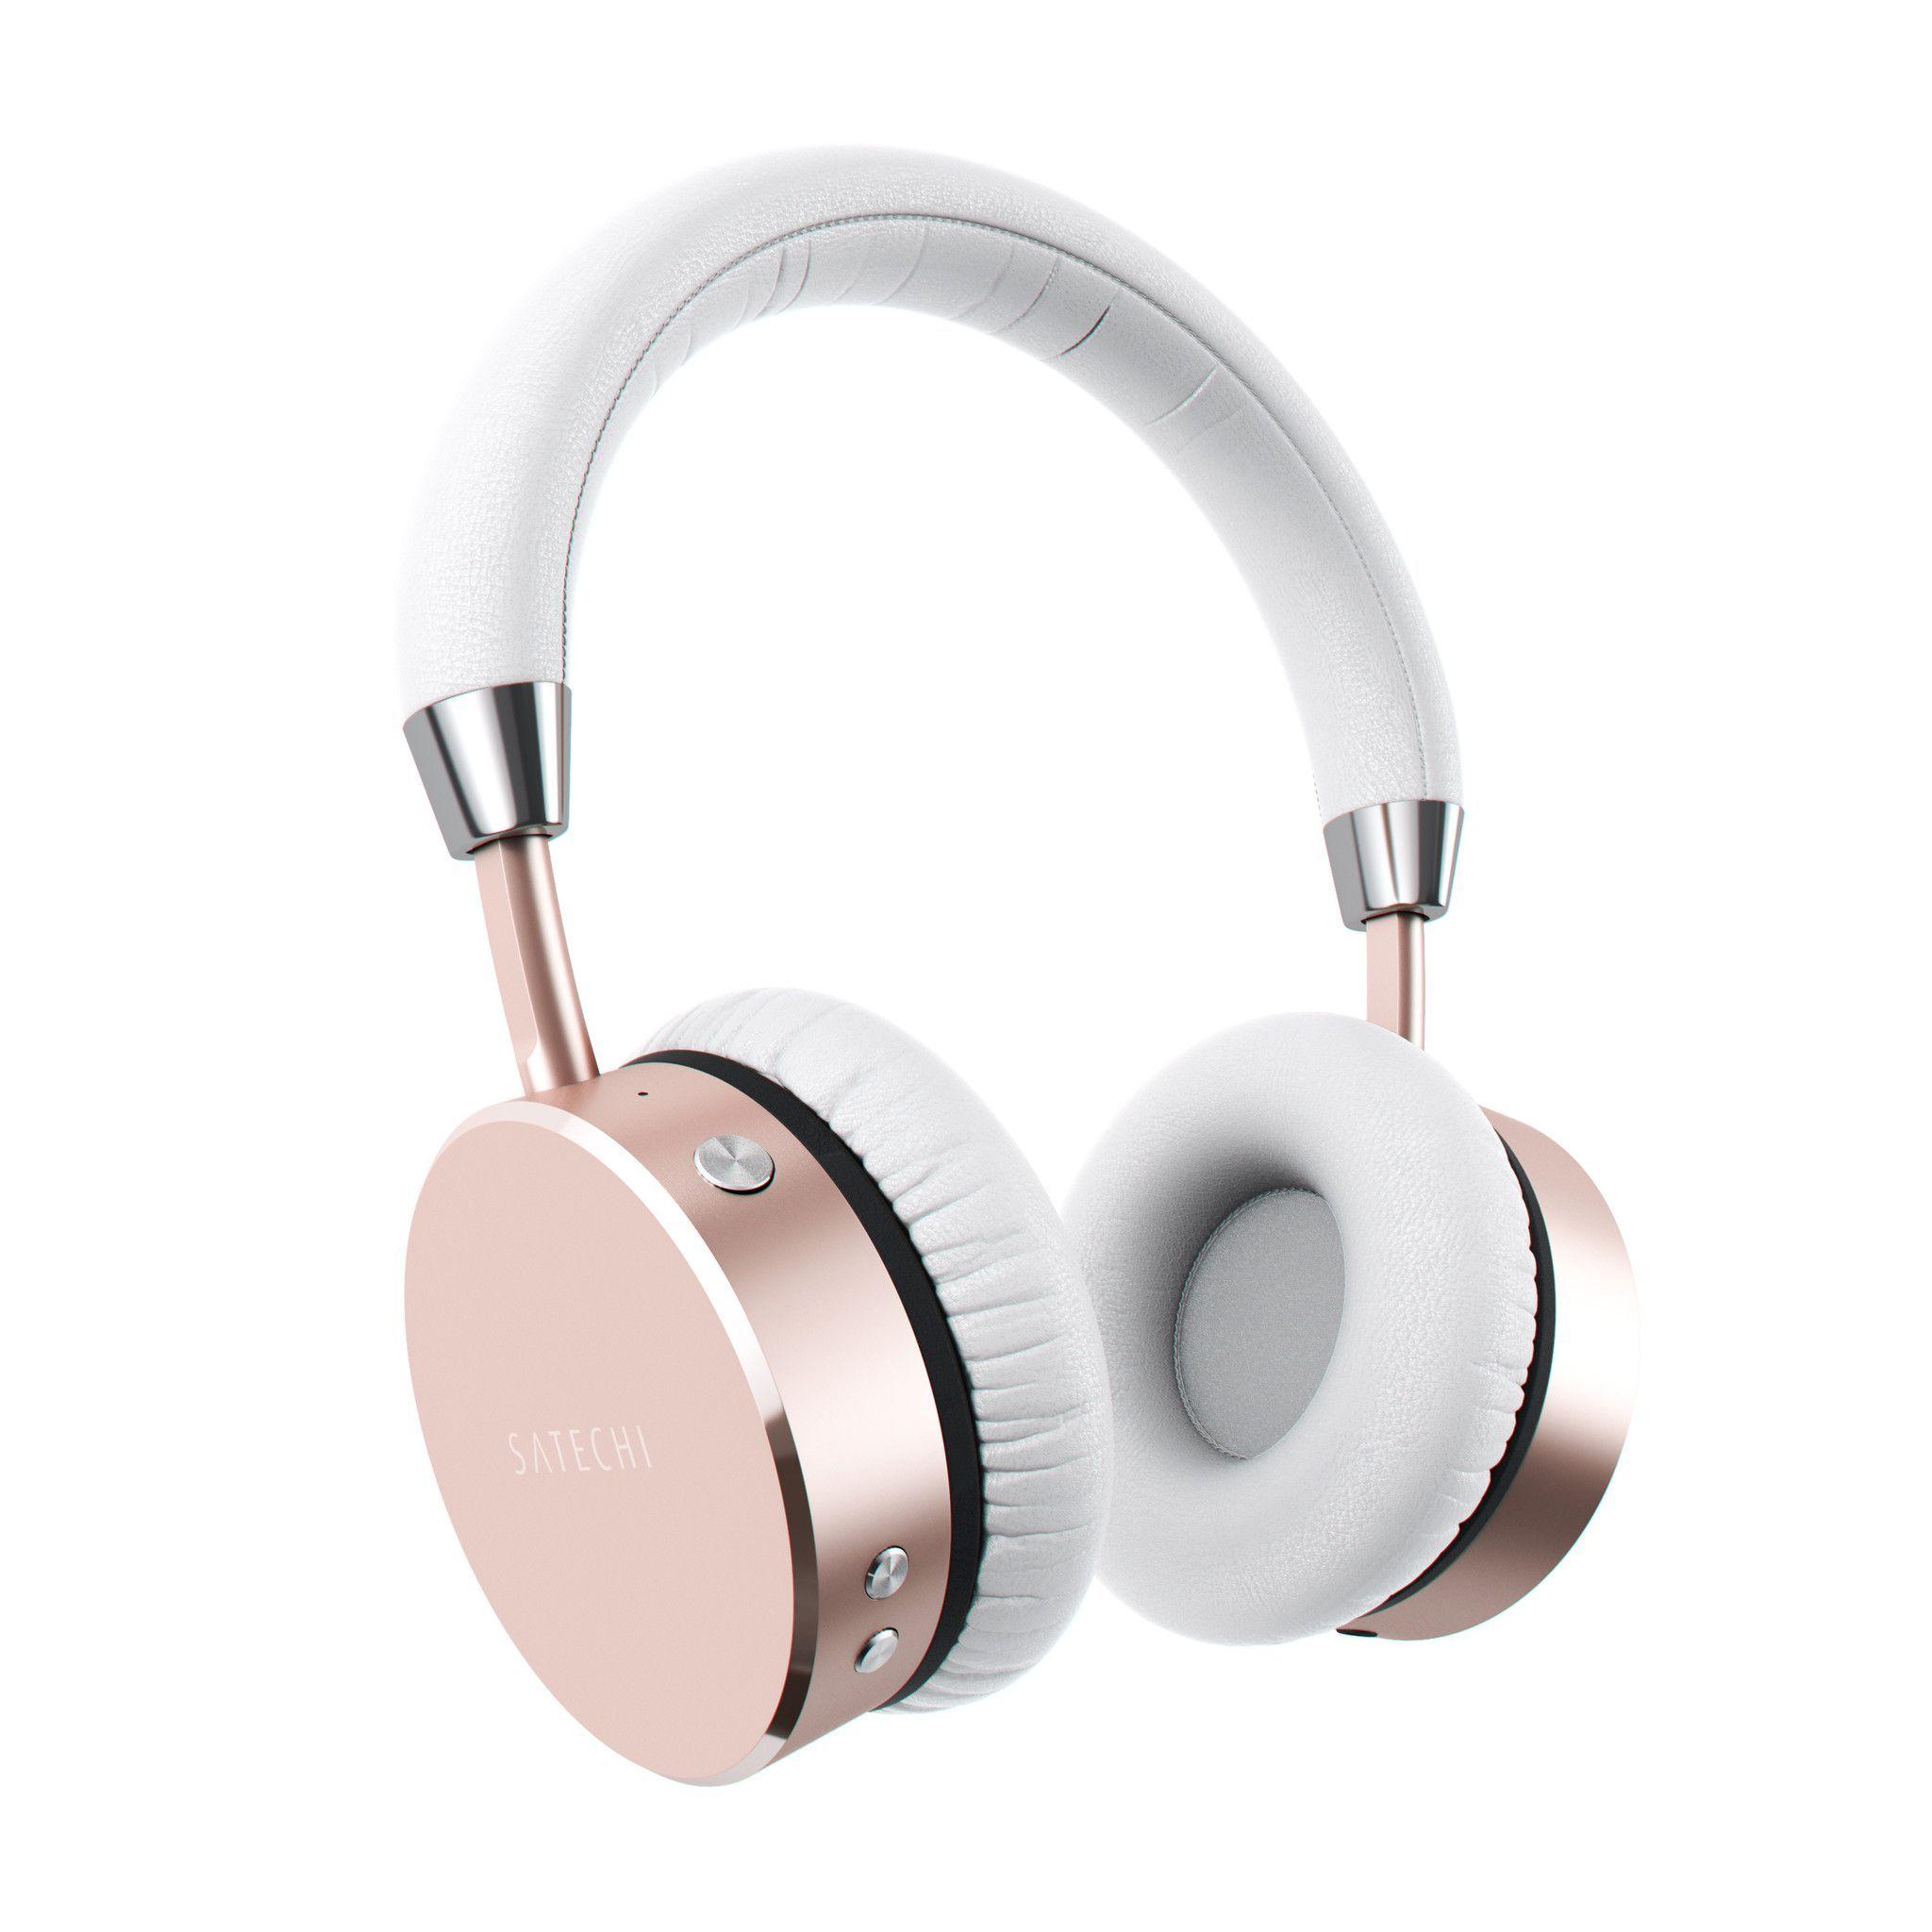 Bluetooth Aluminum Wireless Headphones Wireless Headphones Rose Gold Wireless Headphones Headphones